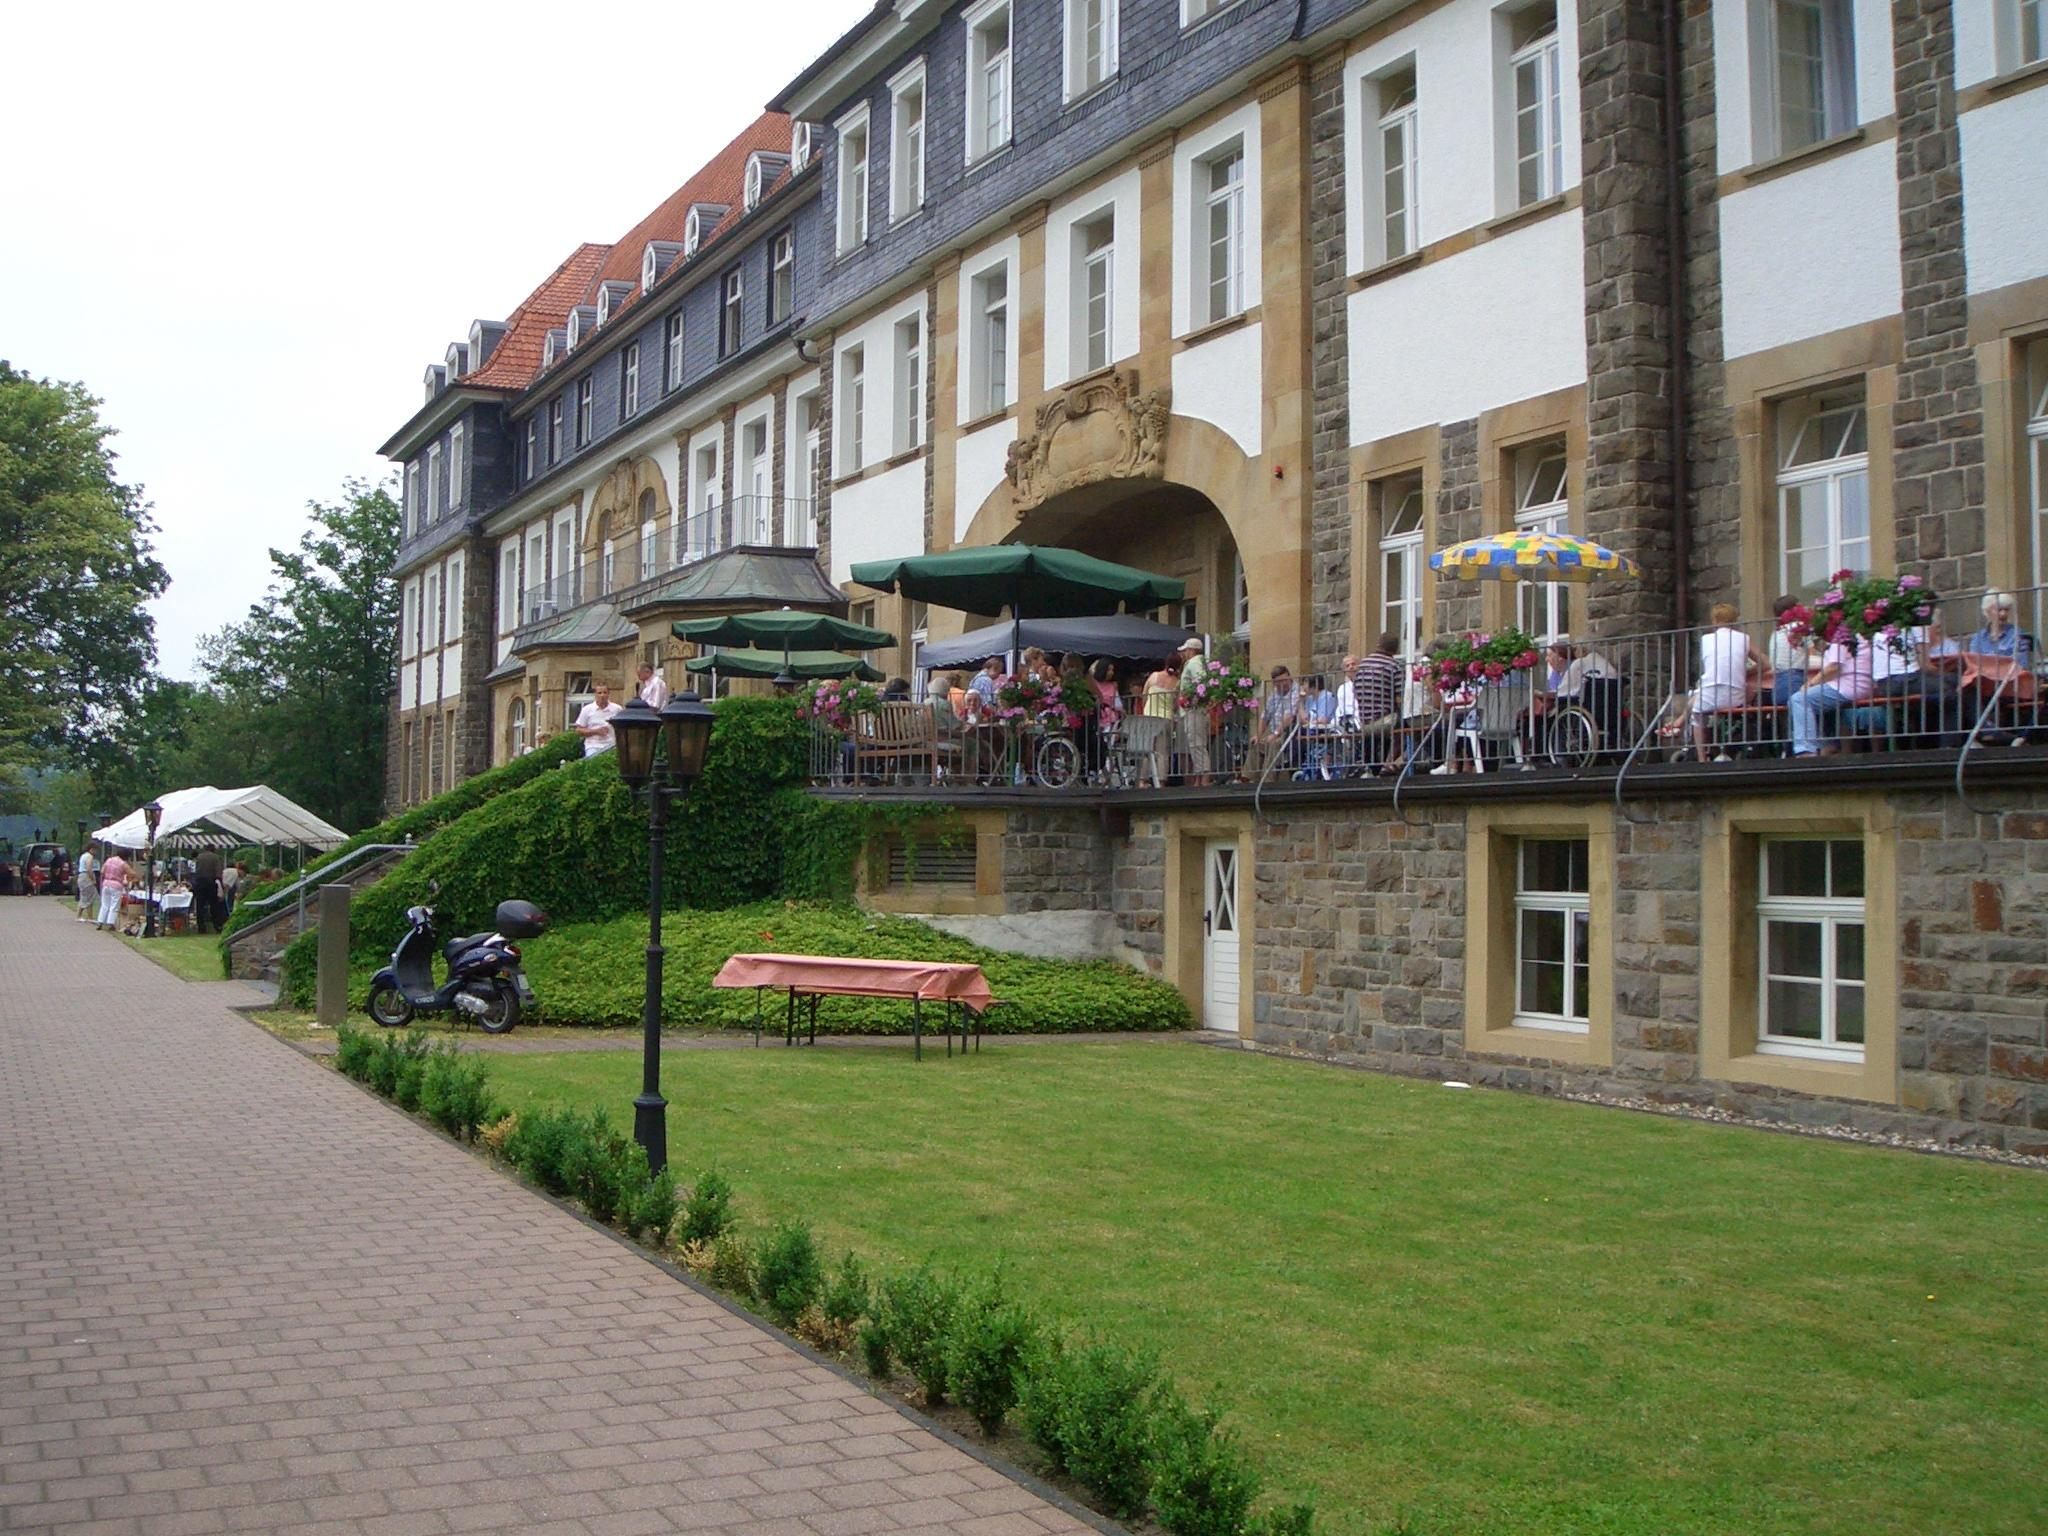 Seniorenresidenz am Burgberg